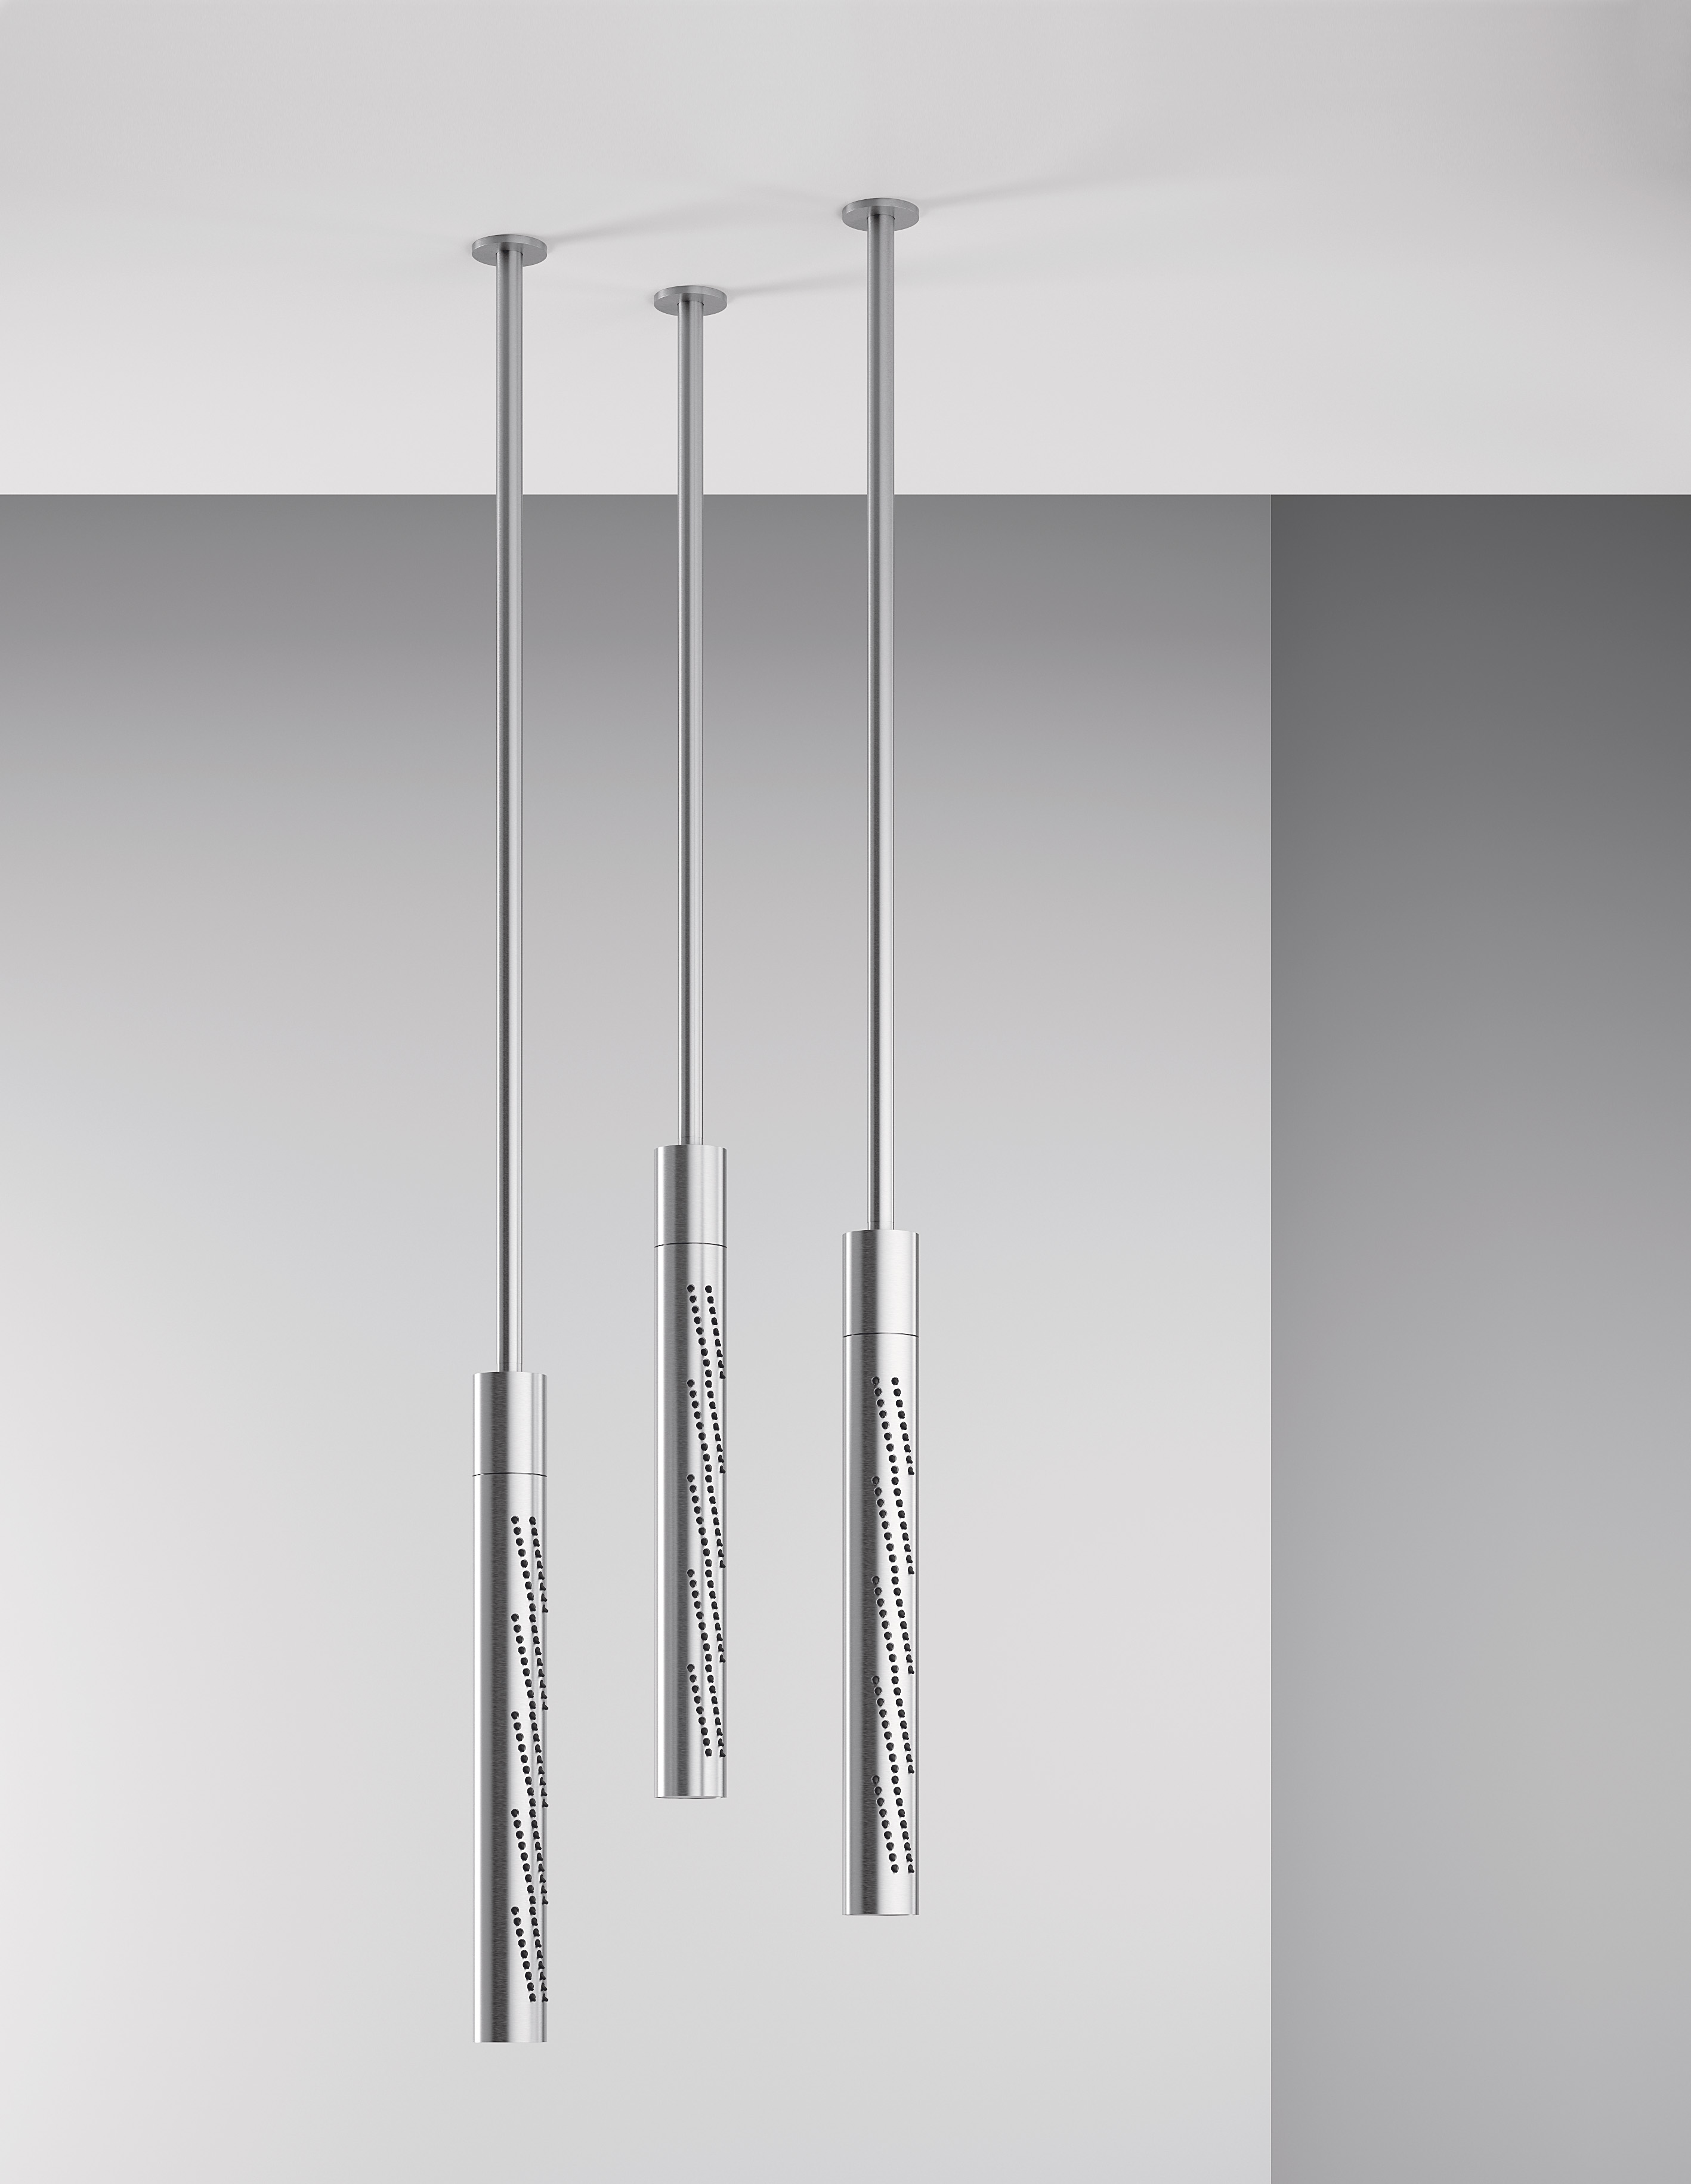 PREVIEW SALONE DEL MOBILE 2018 – Z316 The innovative shower applications with a tubular design – Design Roberto Innocenti